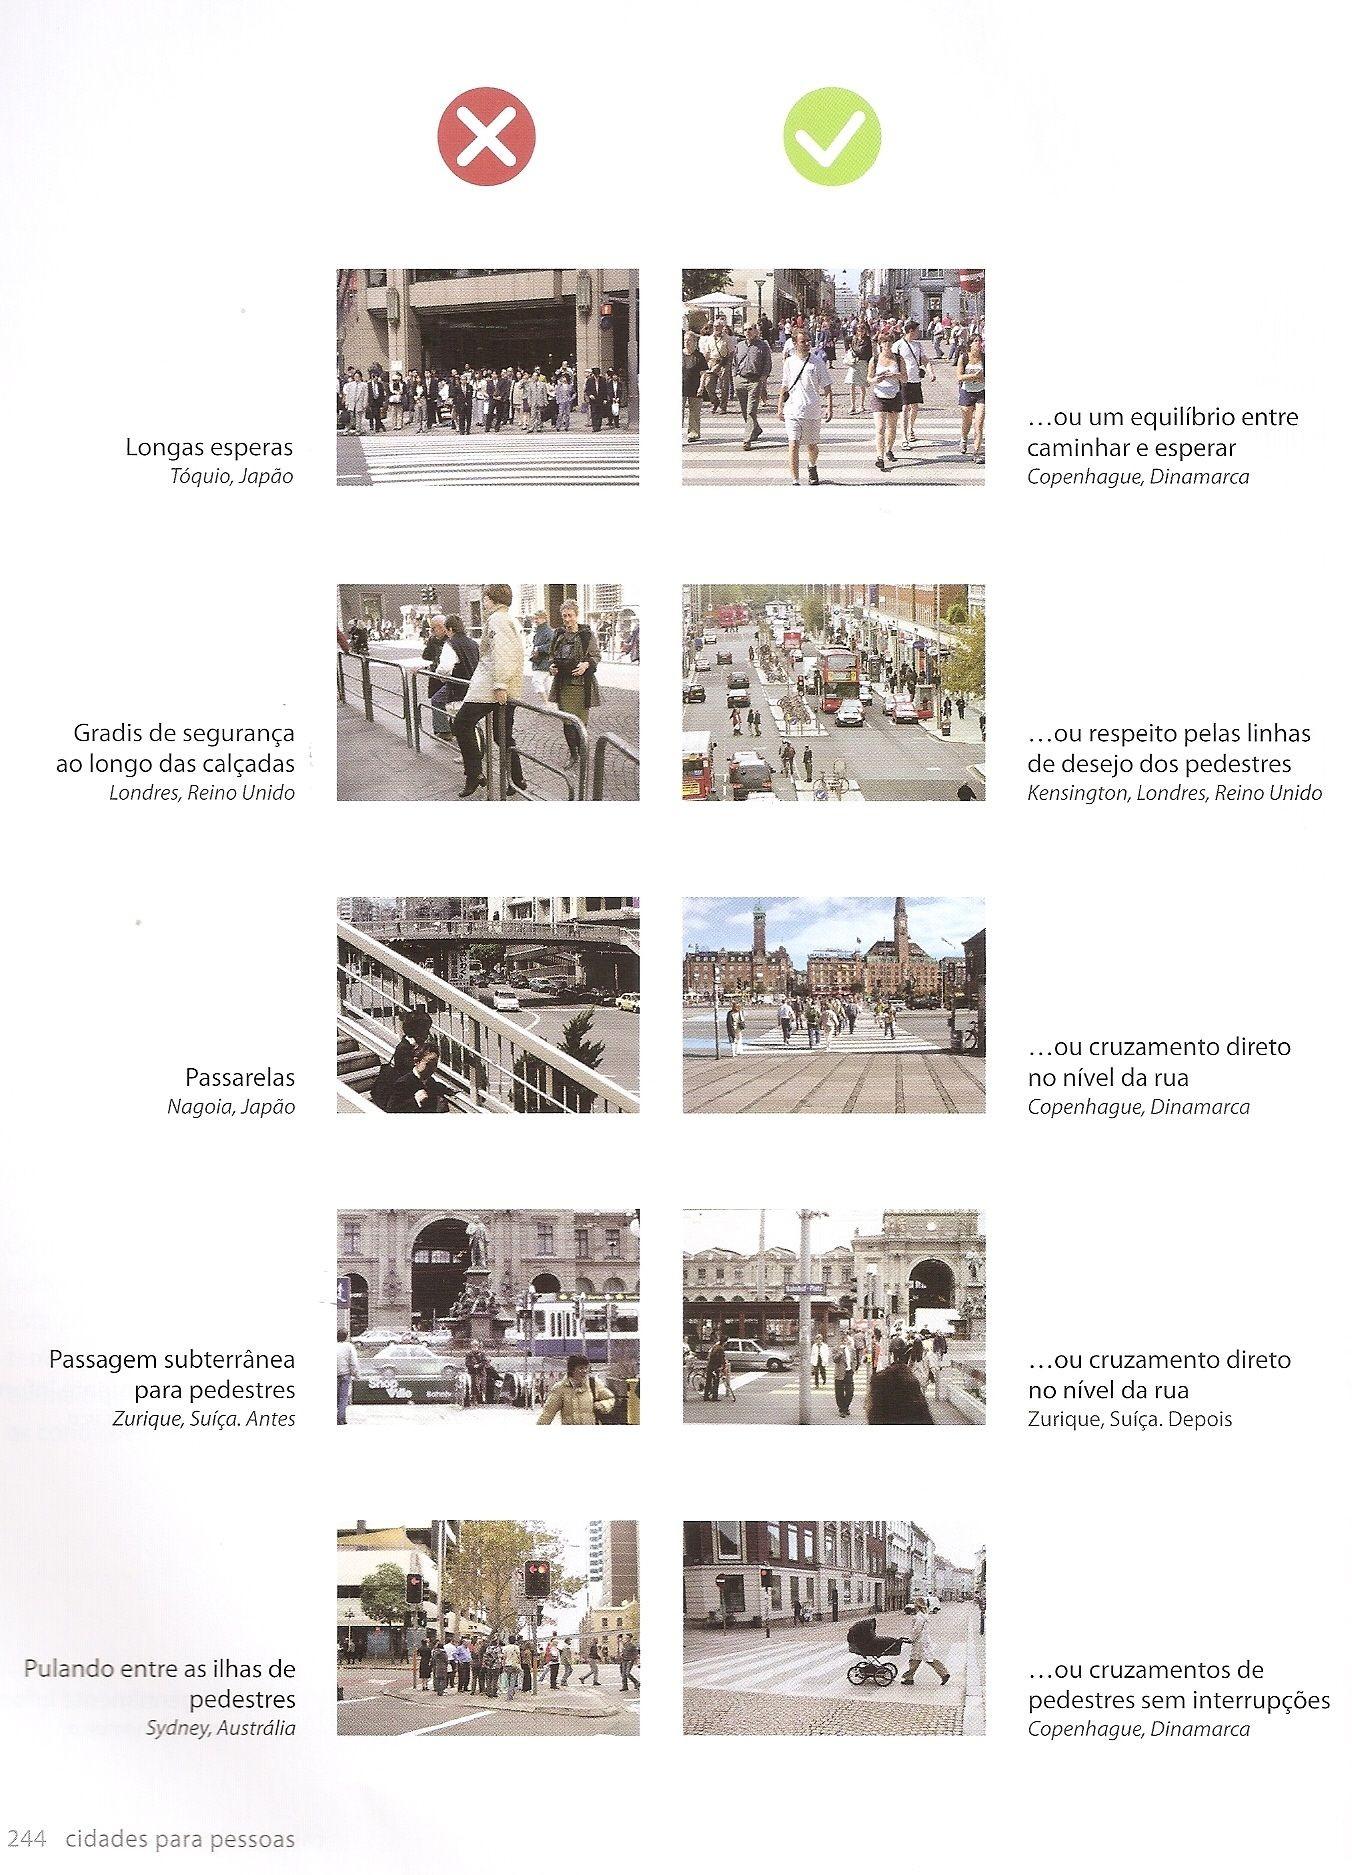 Cidade para Pessoas Jan Gehl